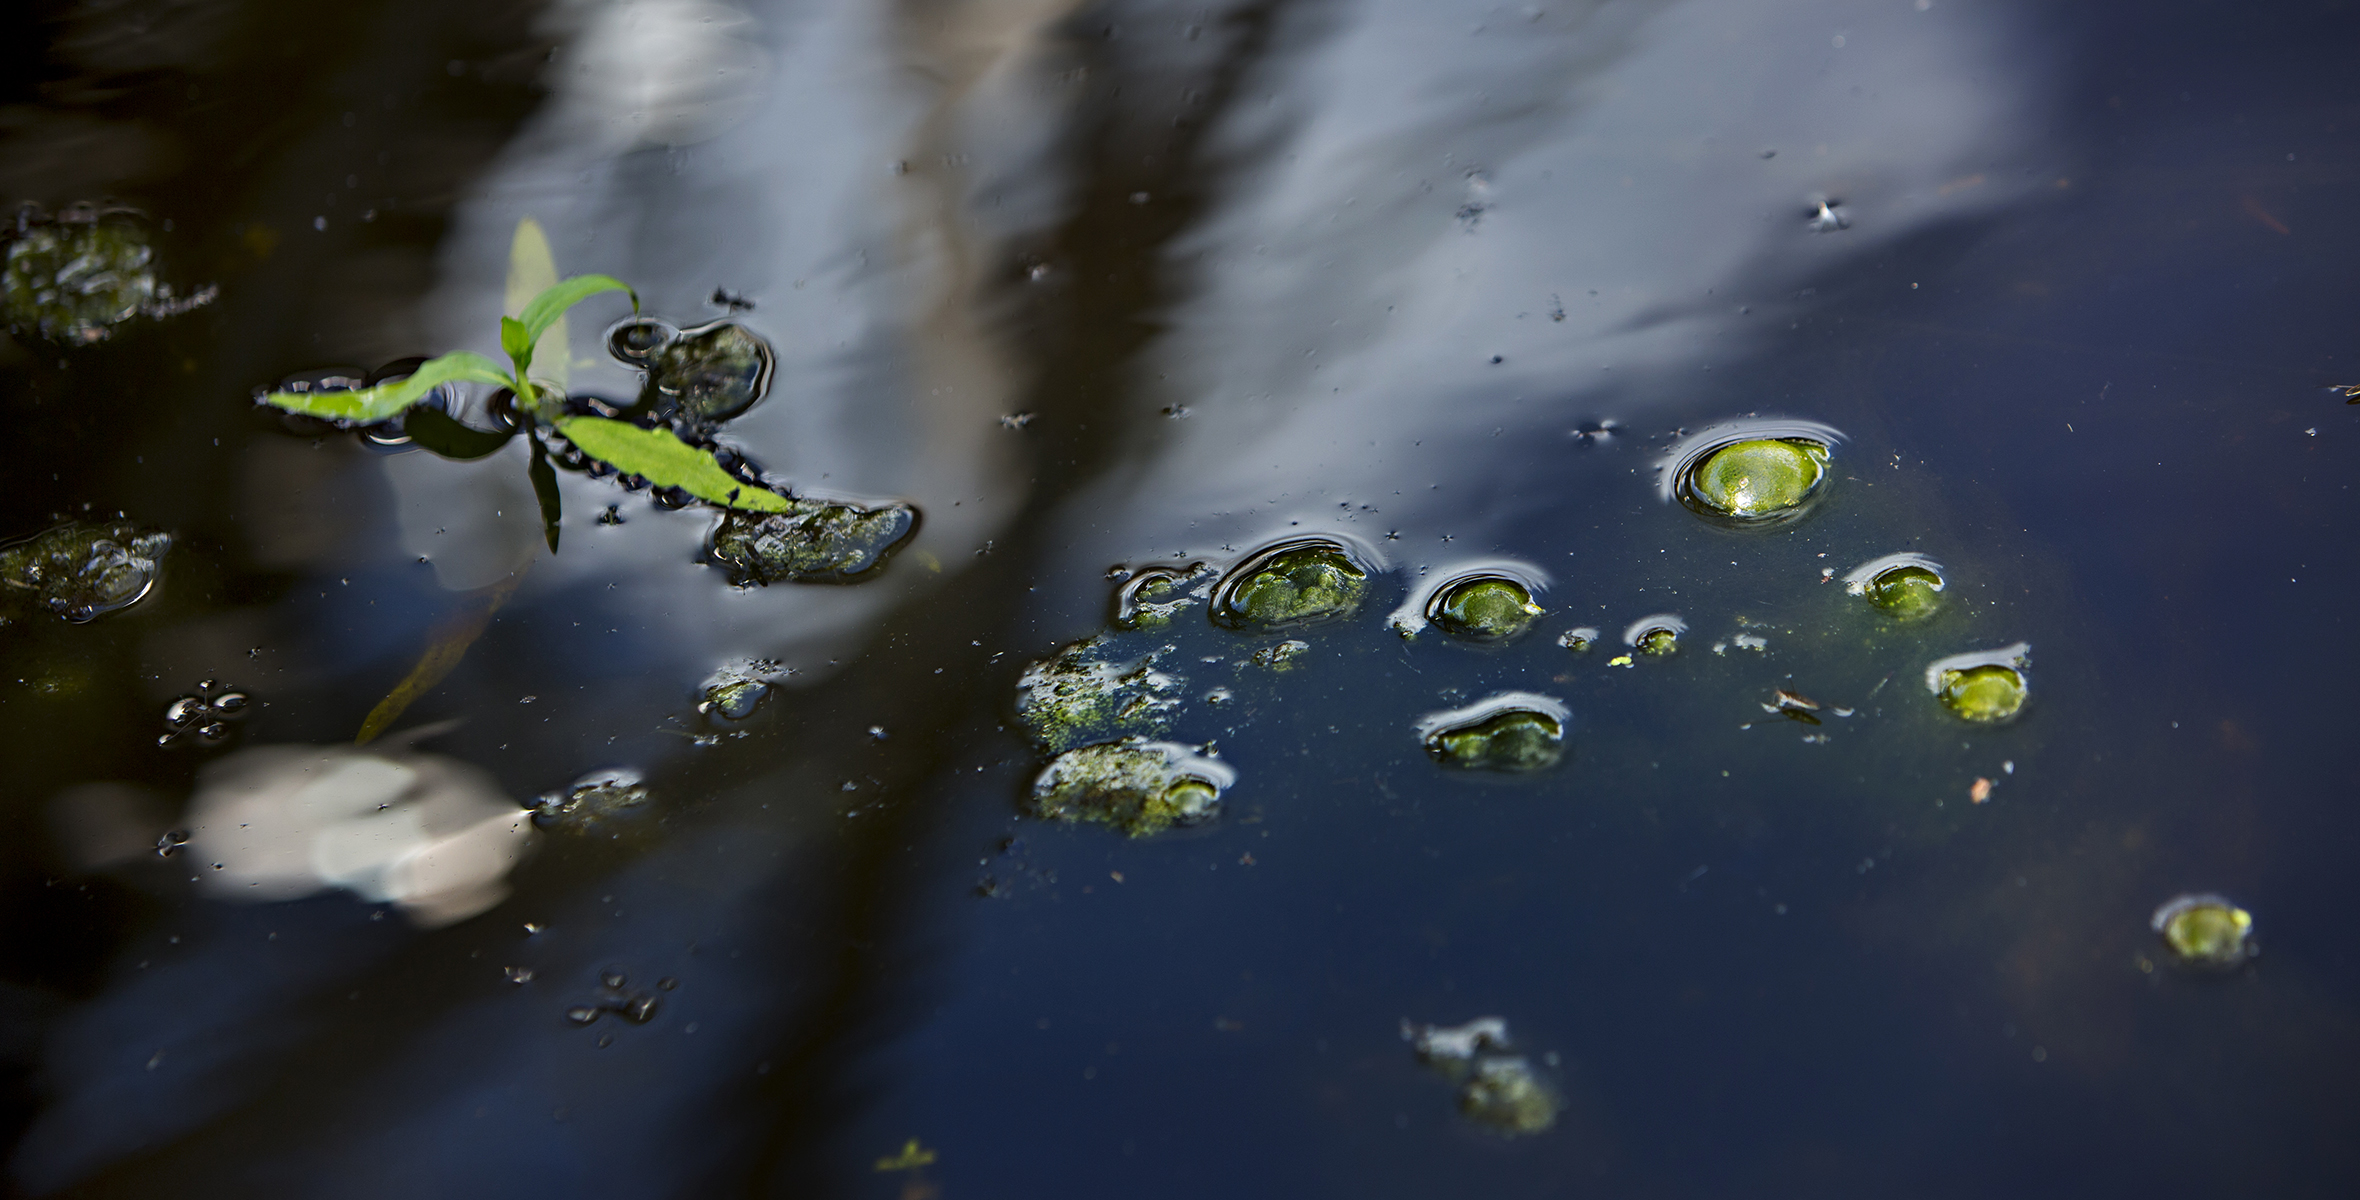 Dikade våtmarker